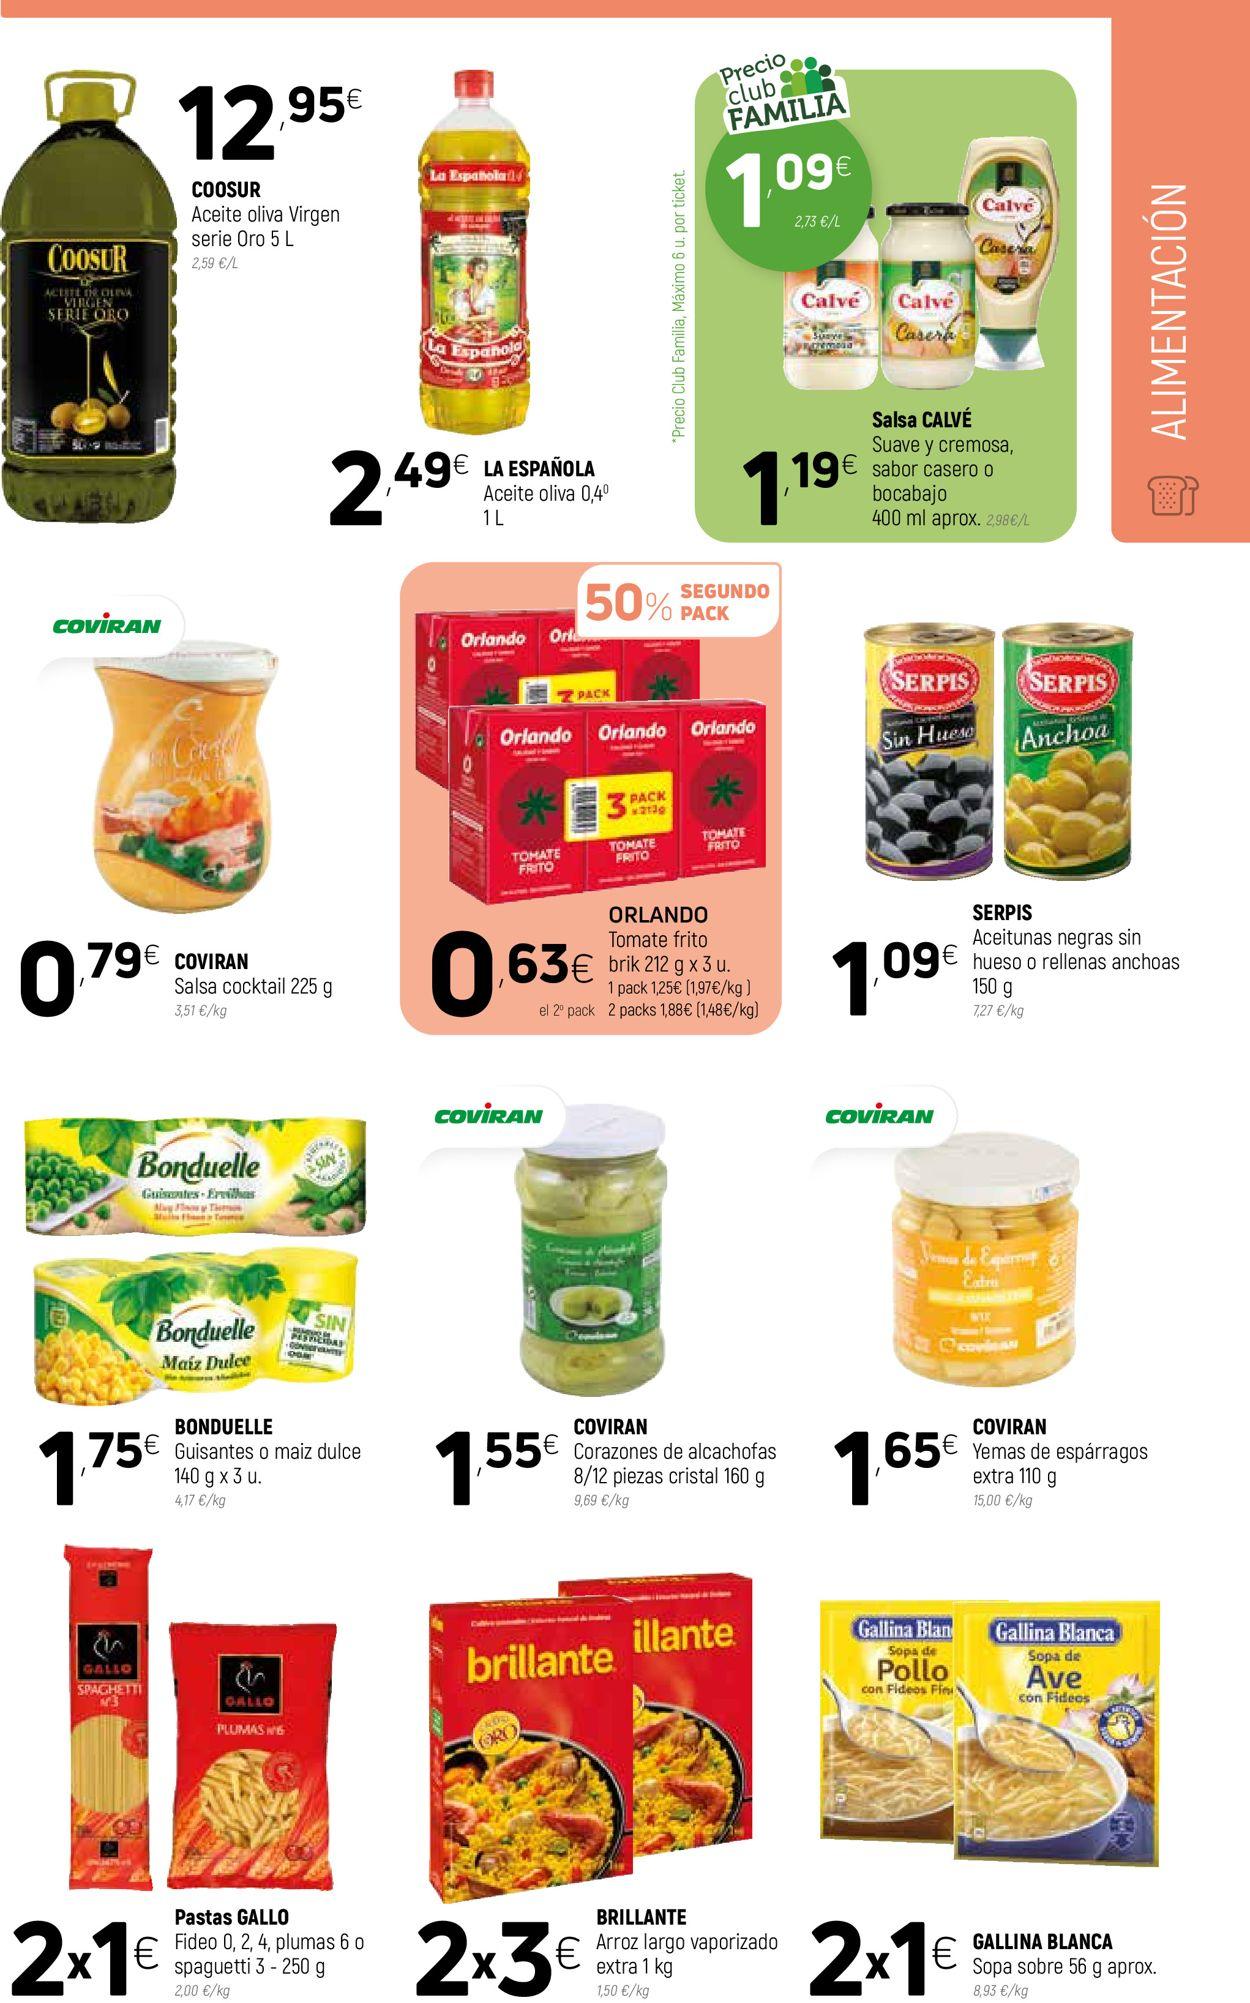 Coviran Folleto - 01.12-15.12.2020 (Página 7)